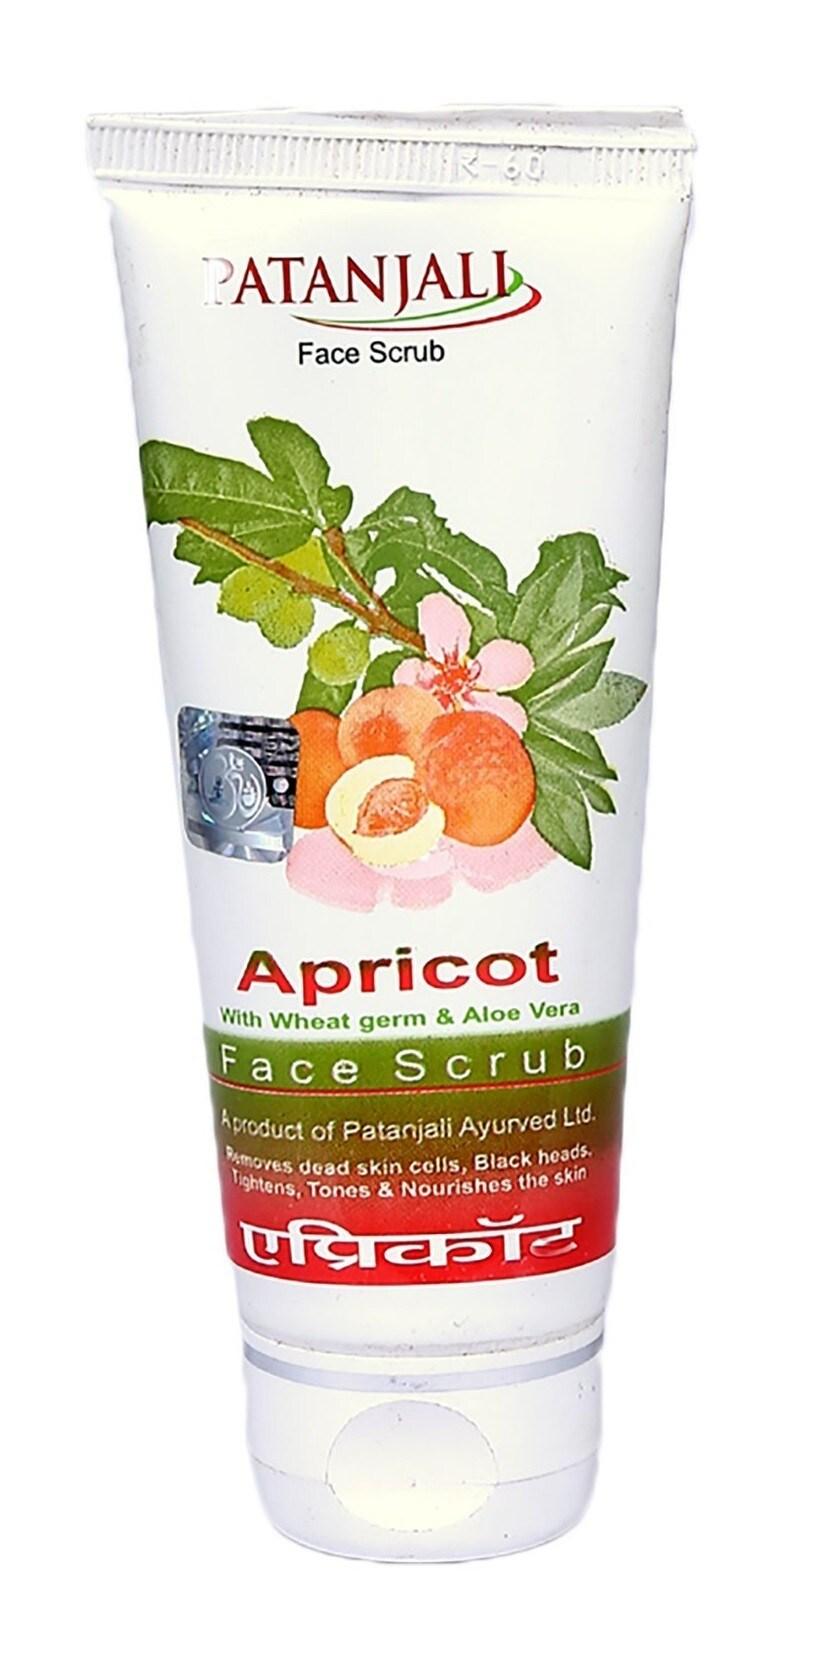 Patanjali Apricot Face Scrub